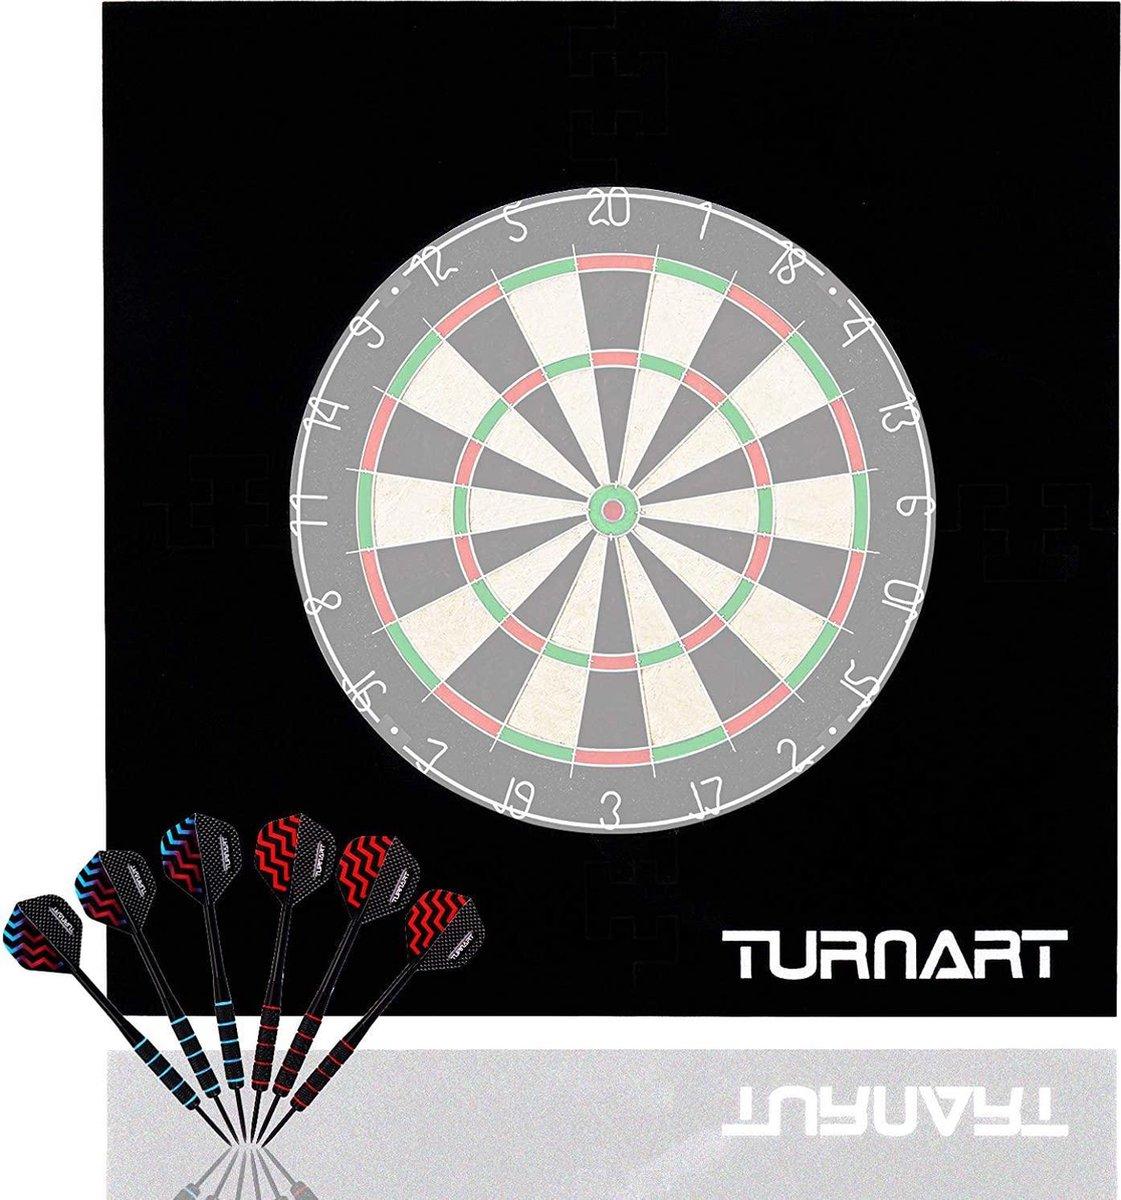 Dartbord Surround Ring - Zinaps Dartboard Dart Catch Ring, Surround Catch Ring, Dart Backboard, Ronde Catch Ring, Eva Ronde Dartboard Surround- (WK 02127)